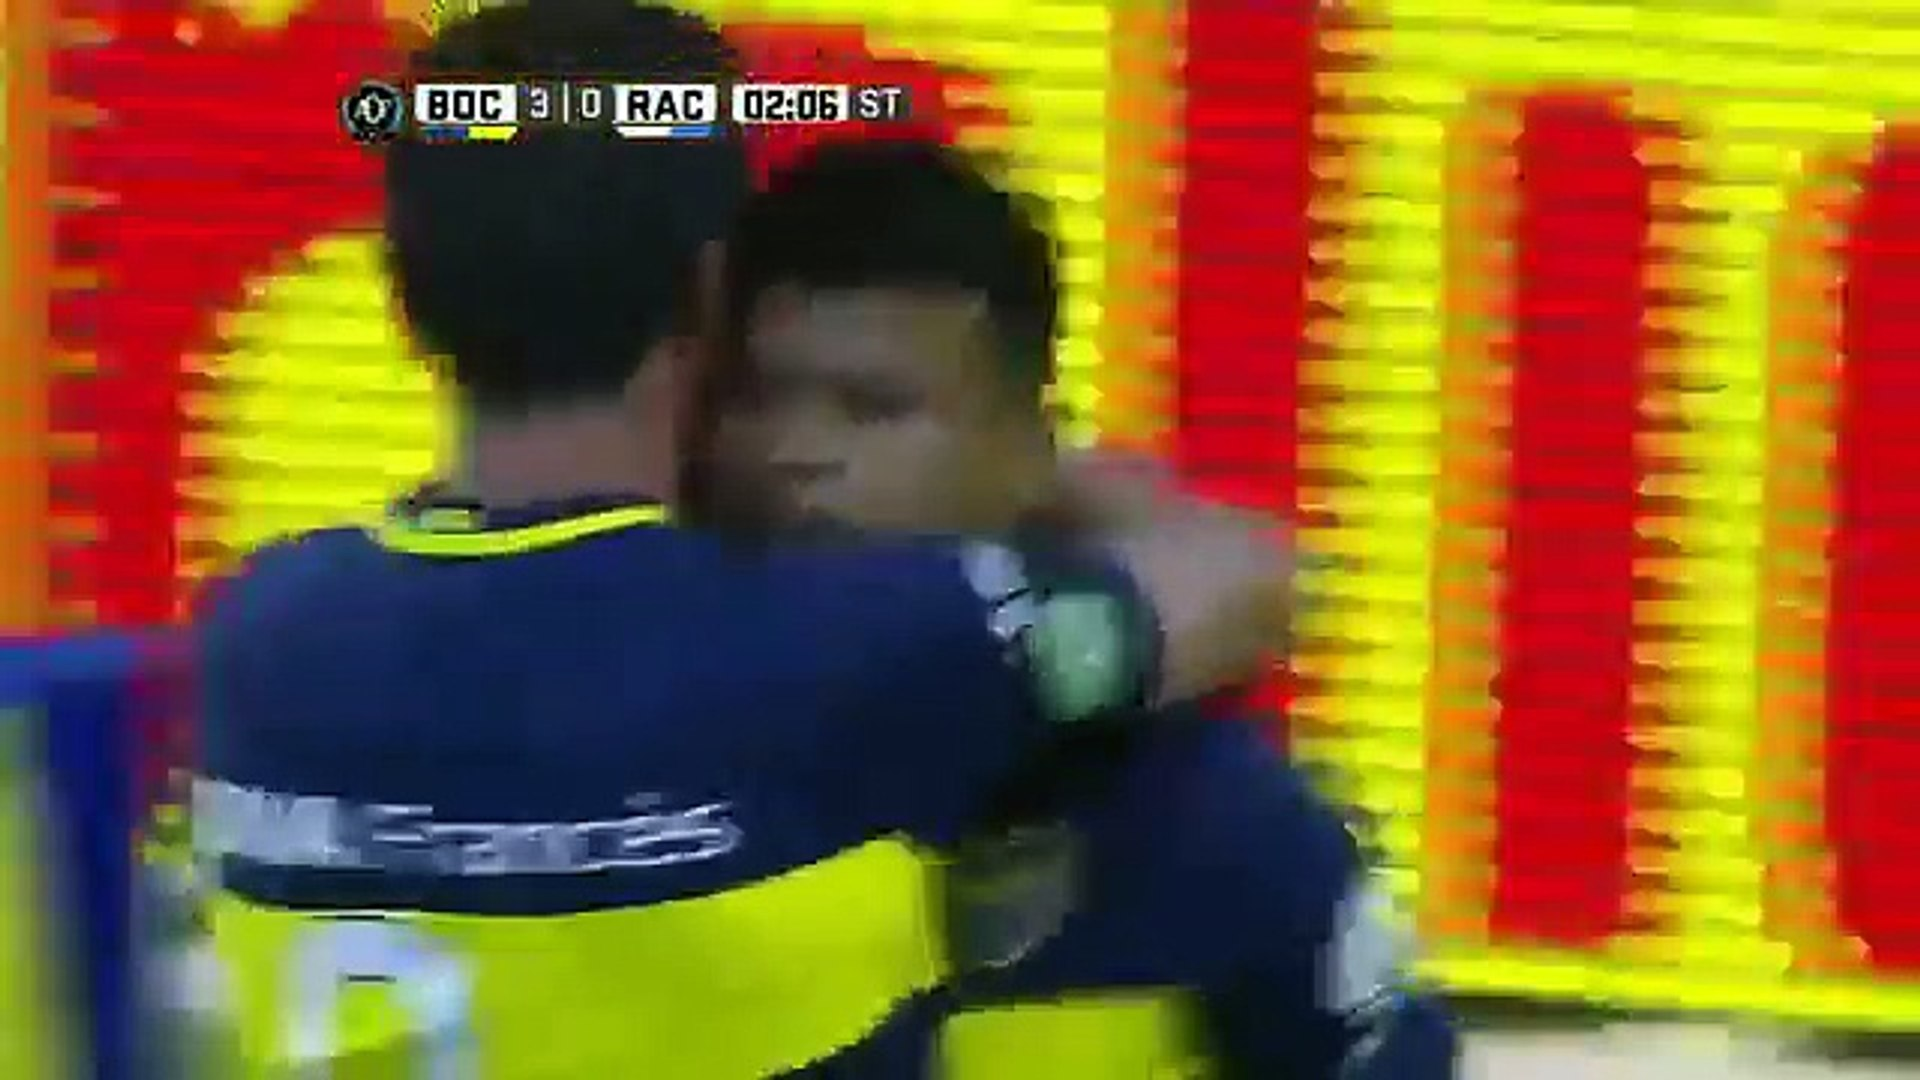 Liga Argentina 2016/17: J12 - Boca Juniors 4 - 2 Racing Club (04.12.2016)